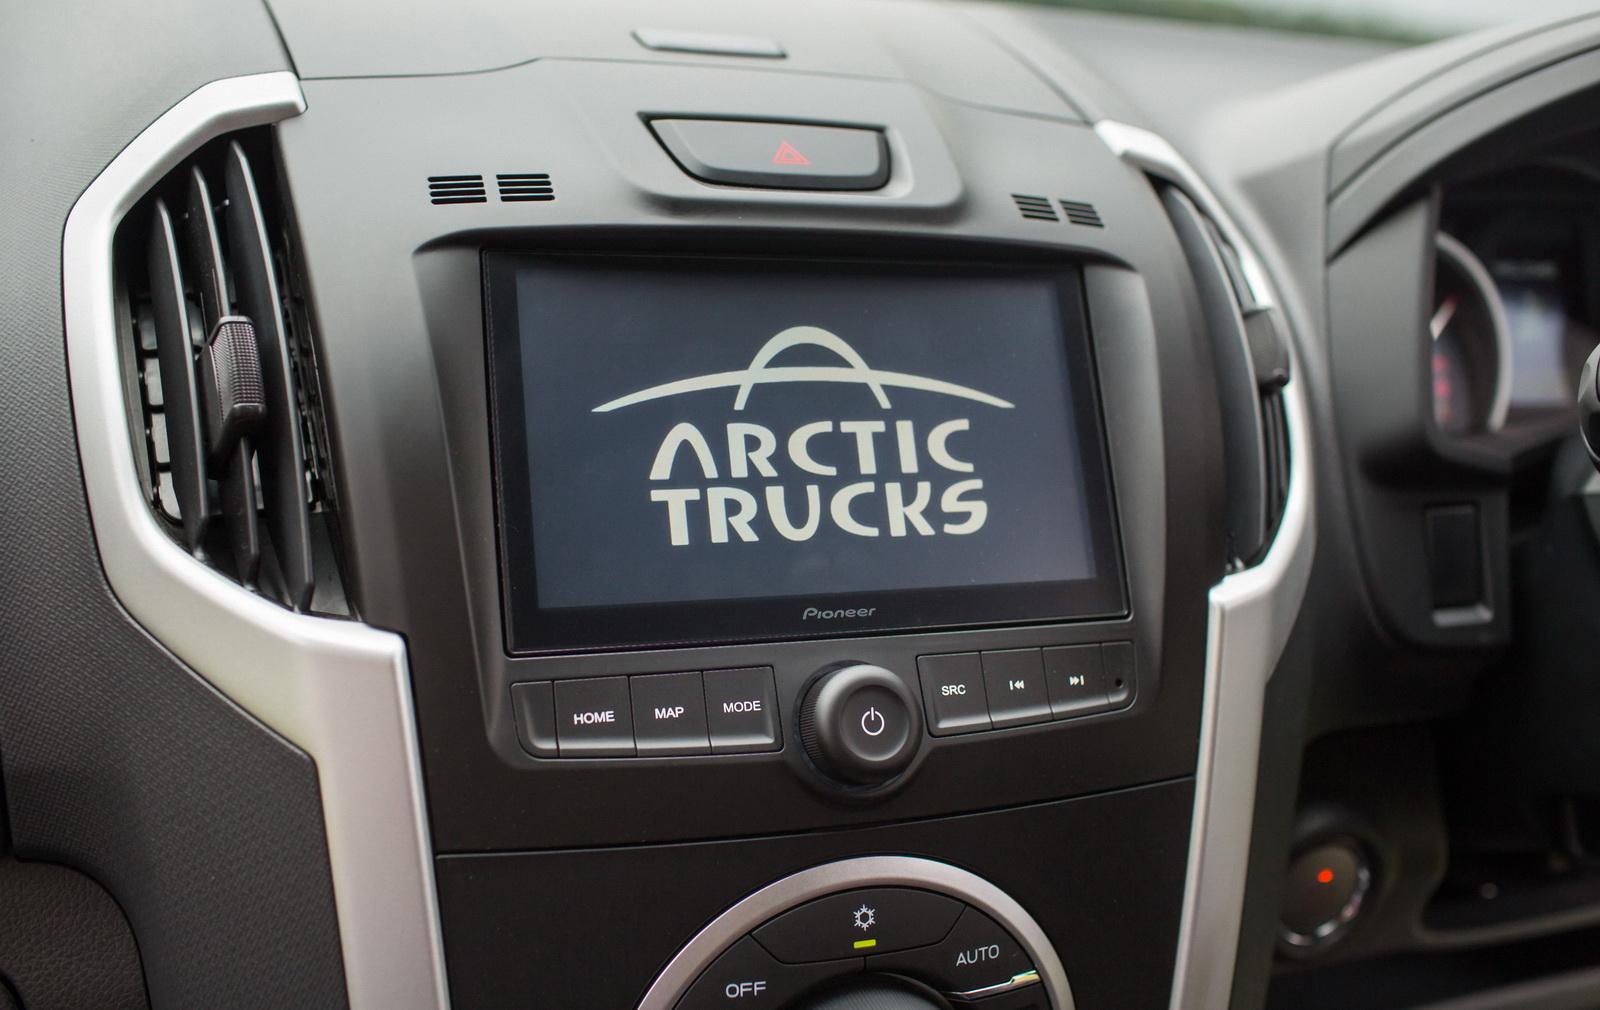 2017_Isuzu_D-MAX_Arctic_Trucks_AT35_12